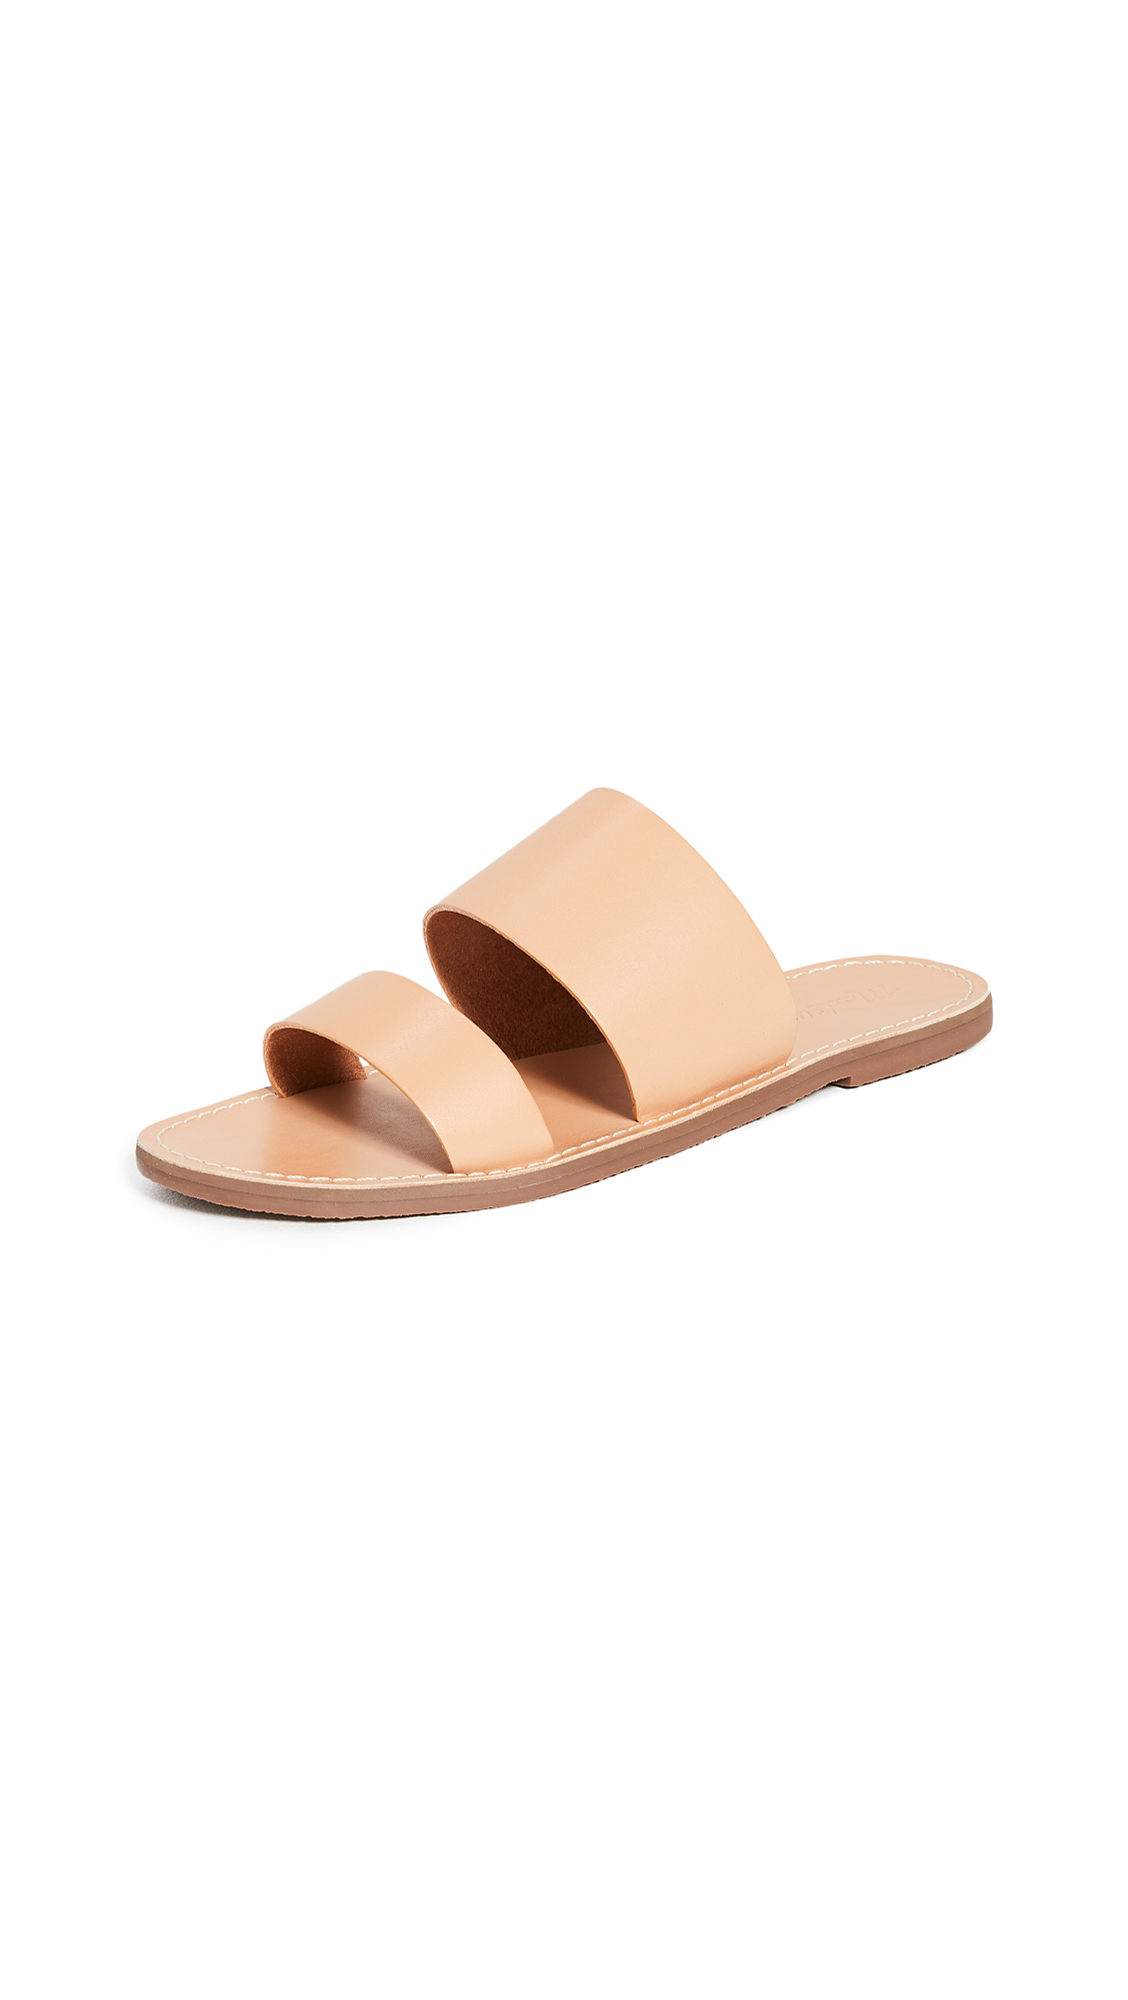 Buy Madewell Boardwalk 2 Strap Randa Slides online, shop Madewell